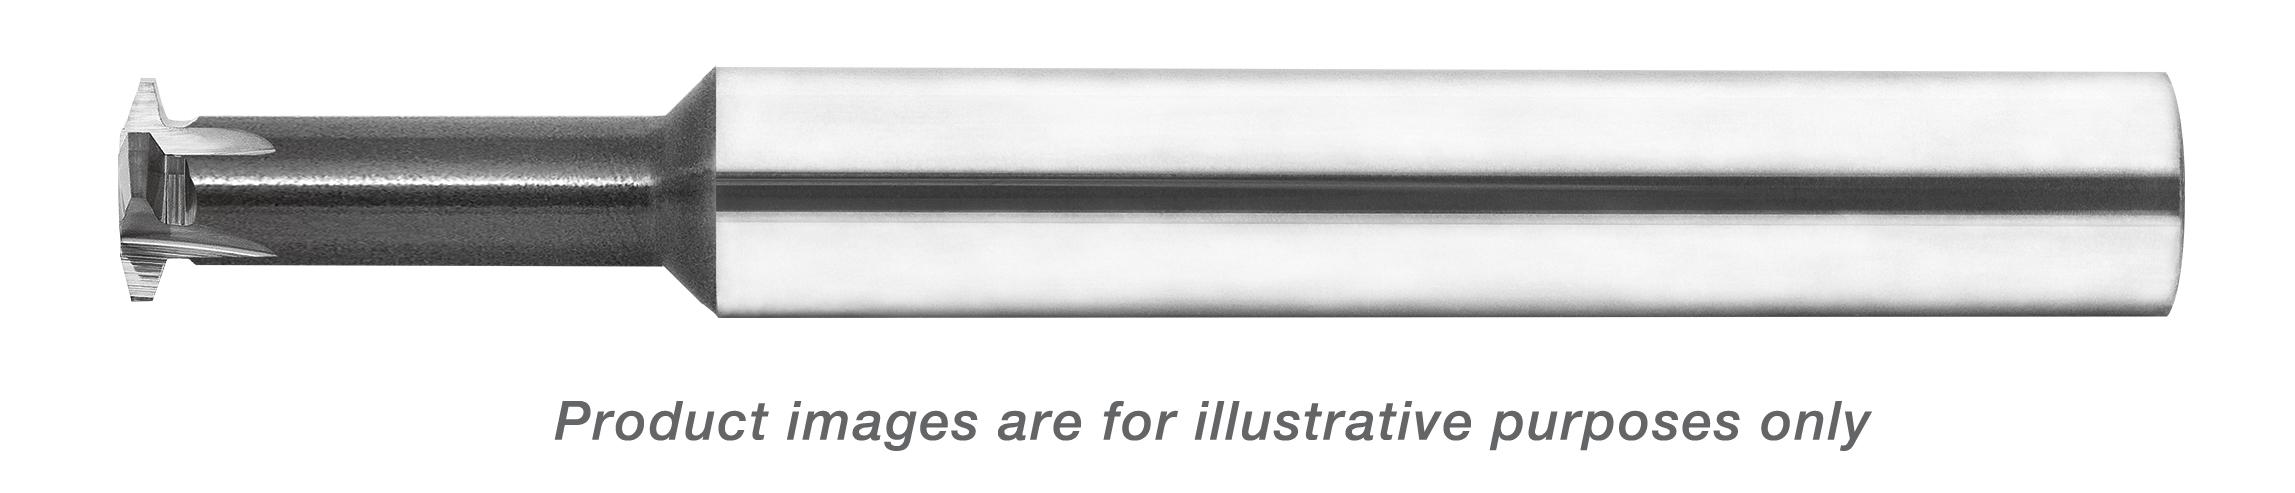 SINGLE PROFILE THREAD MILL CARBIDE (SPTM) 1/2-10 FULL ACME .320 DIA X .750 LOC (4 FLUTES) 3/8 SHANK 3 OAL